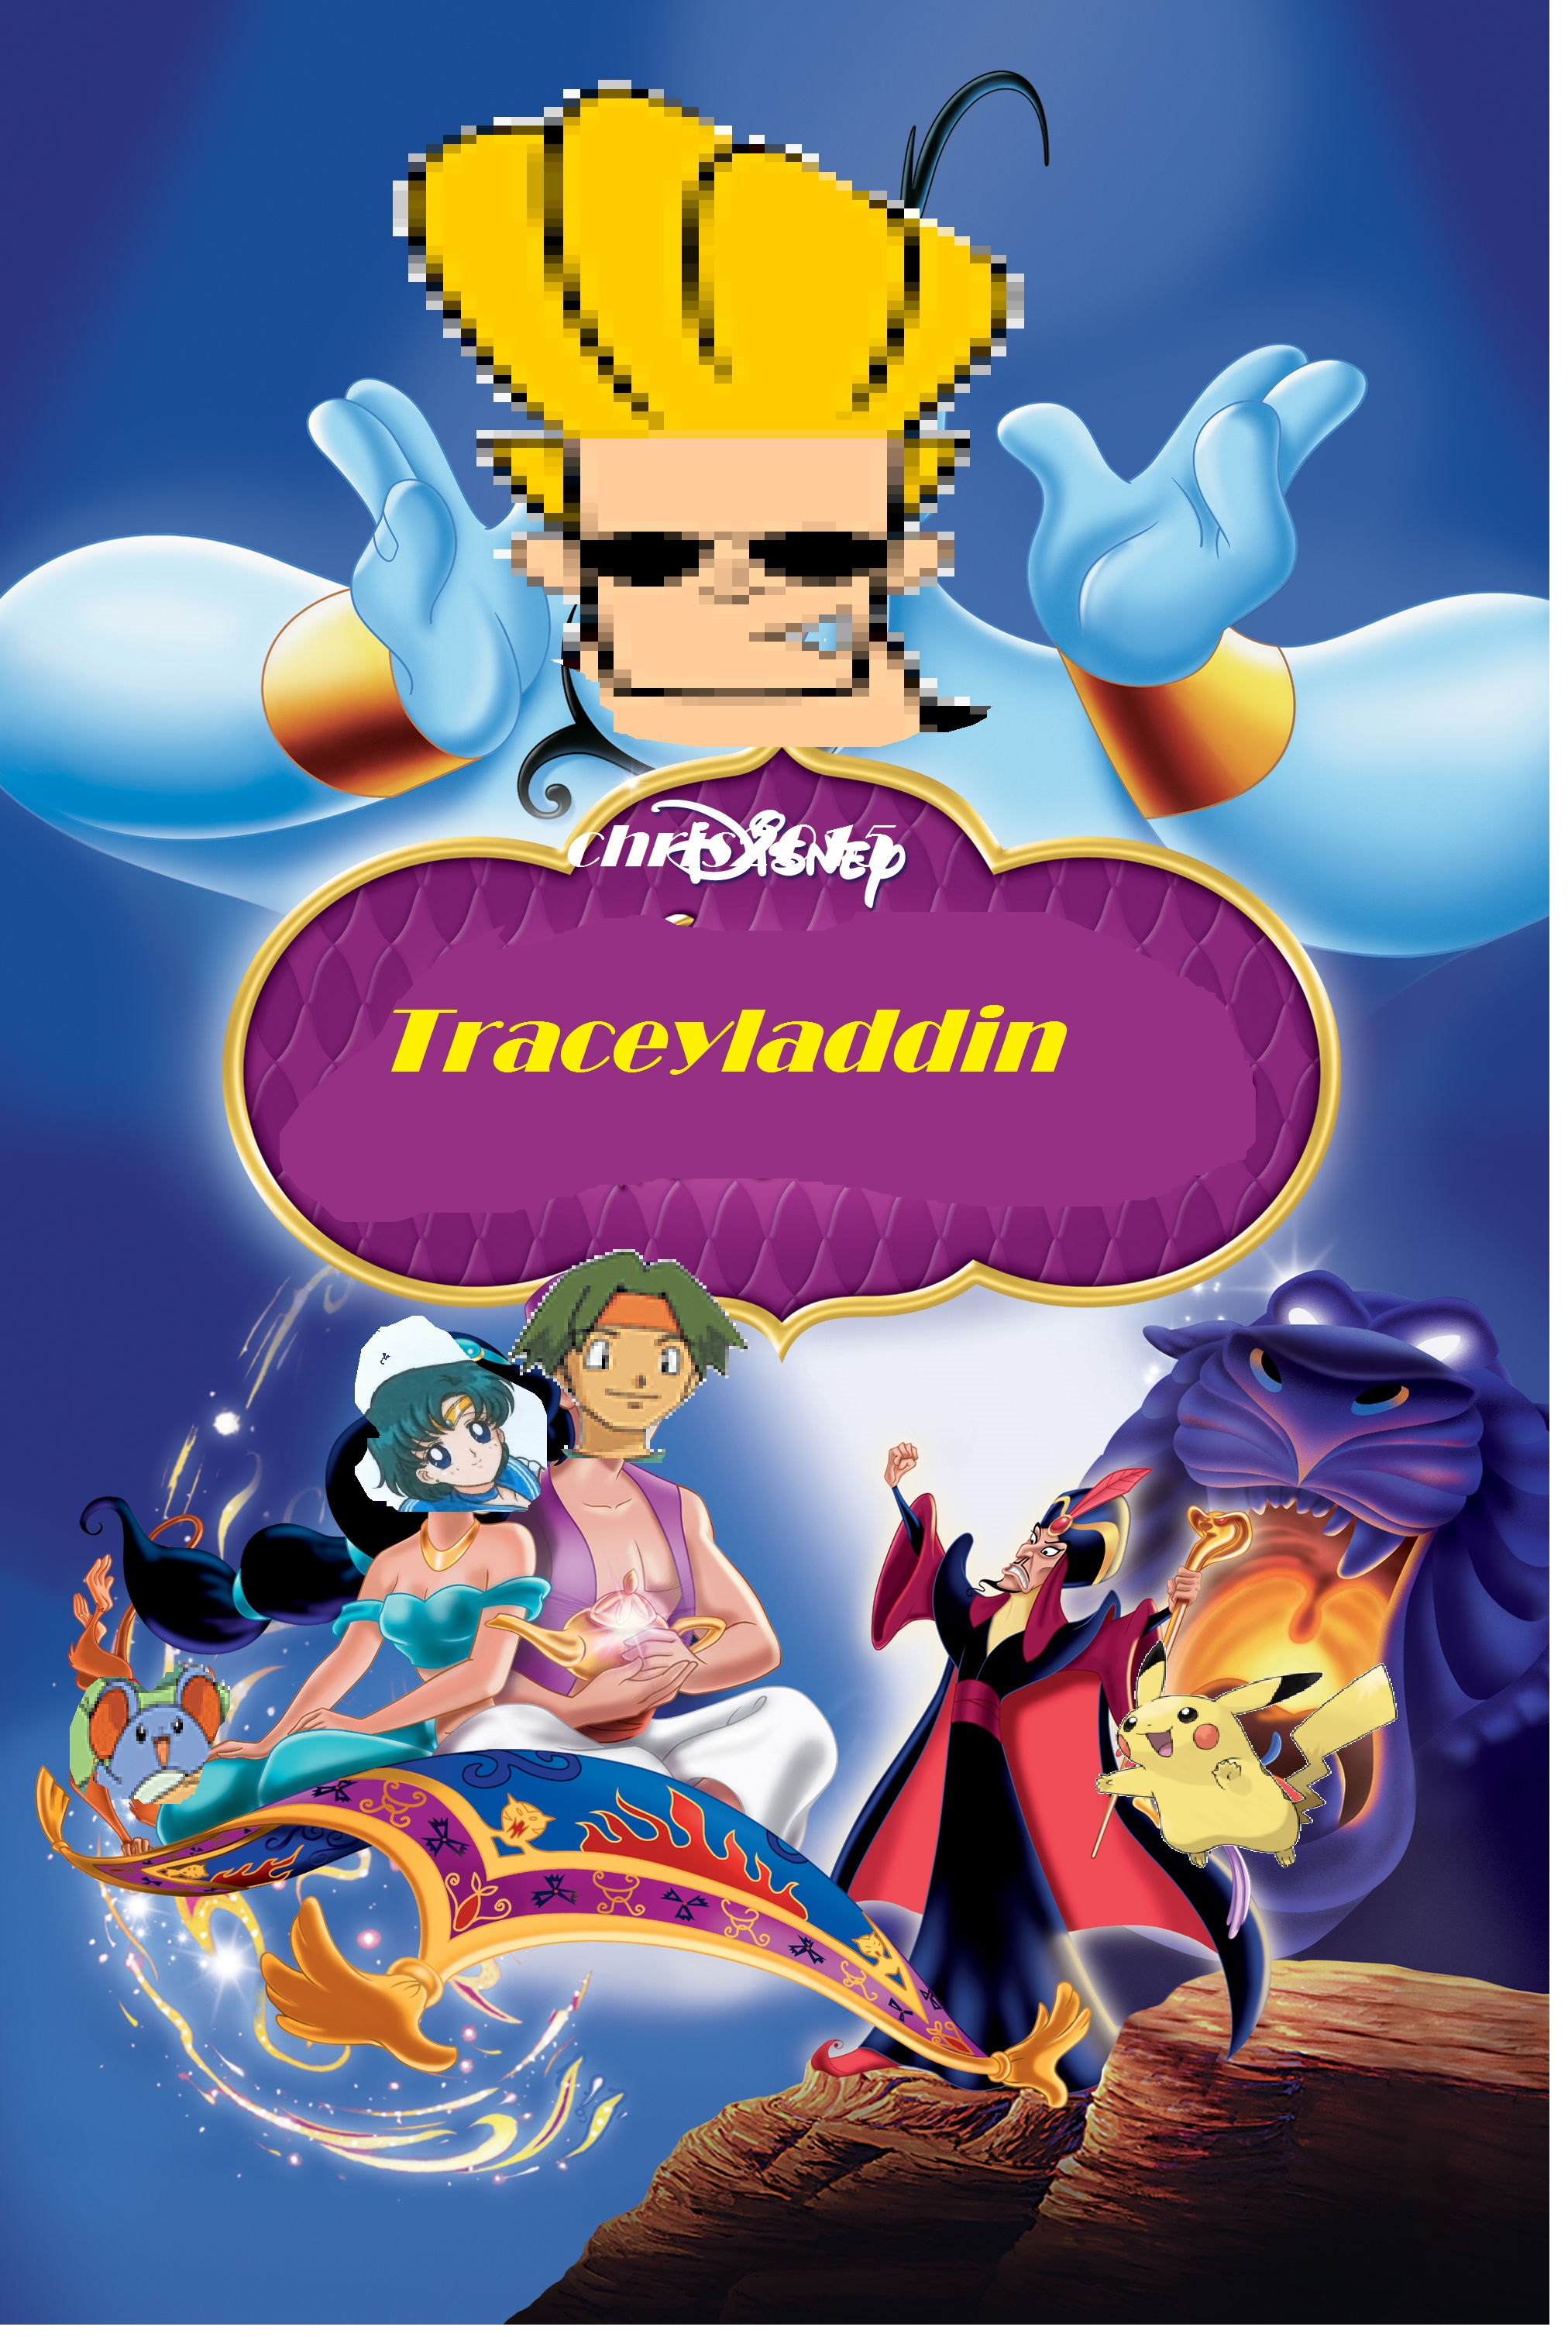 Traceyladdin